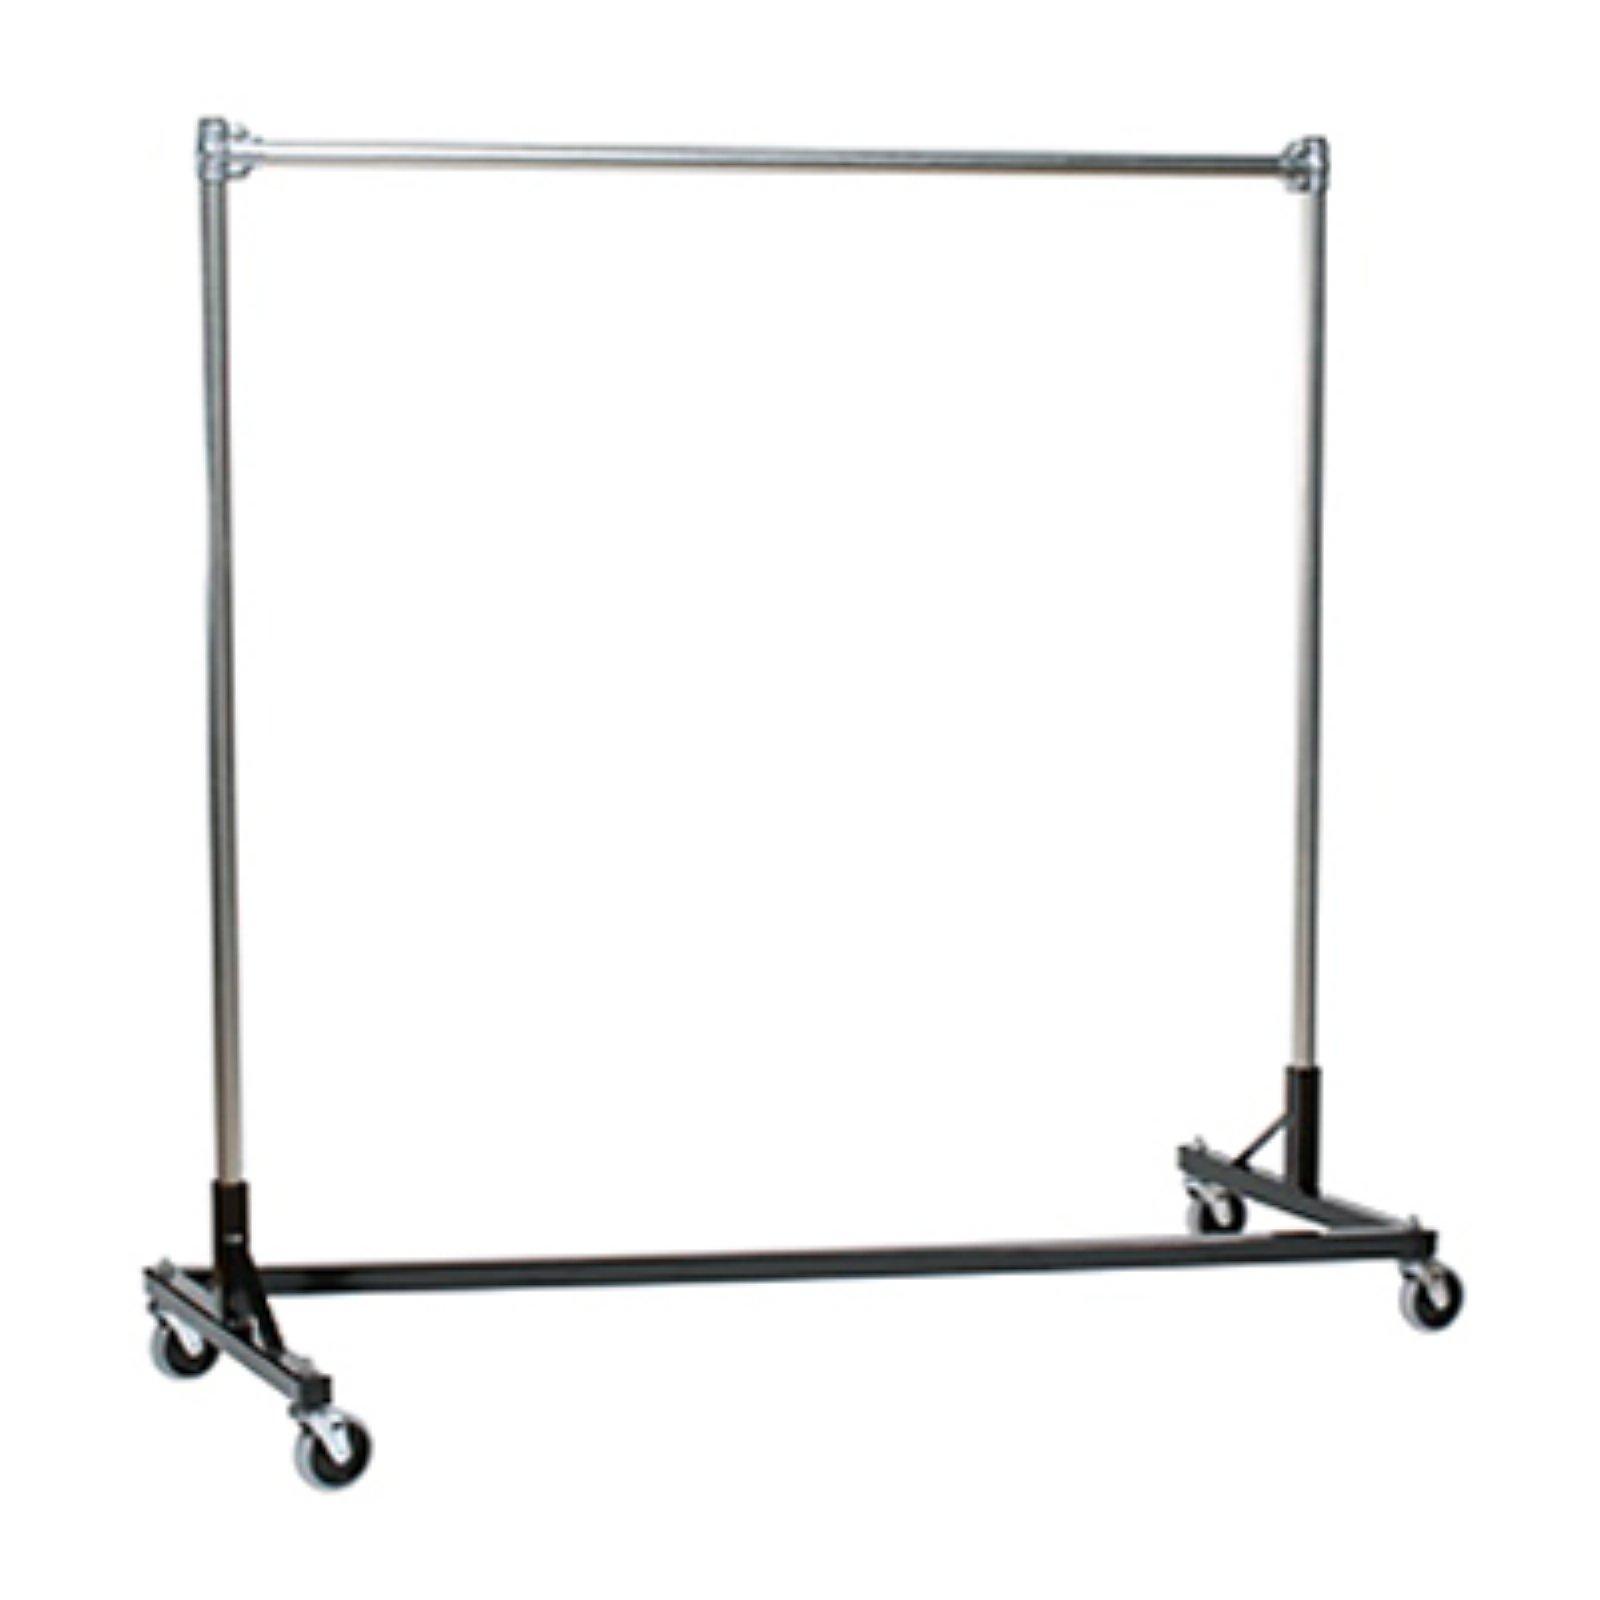 Heavy Duty Steel 500 Lb Capacity 4 Foot Long Z Rolling Rack Silver Garment Racks Metal Clothes Rack Rolling Rack